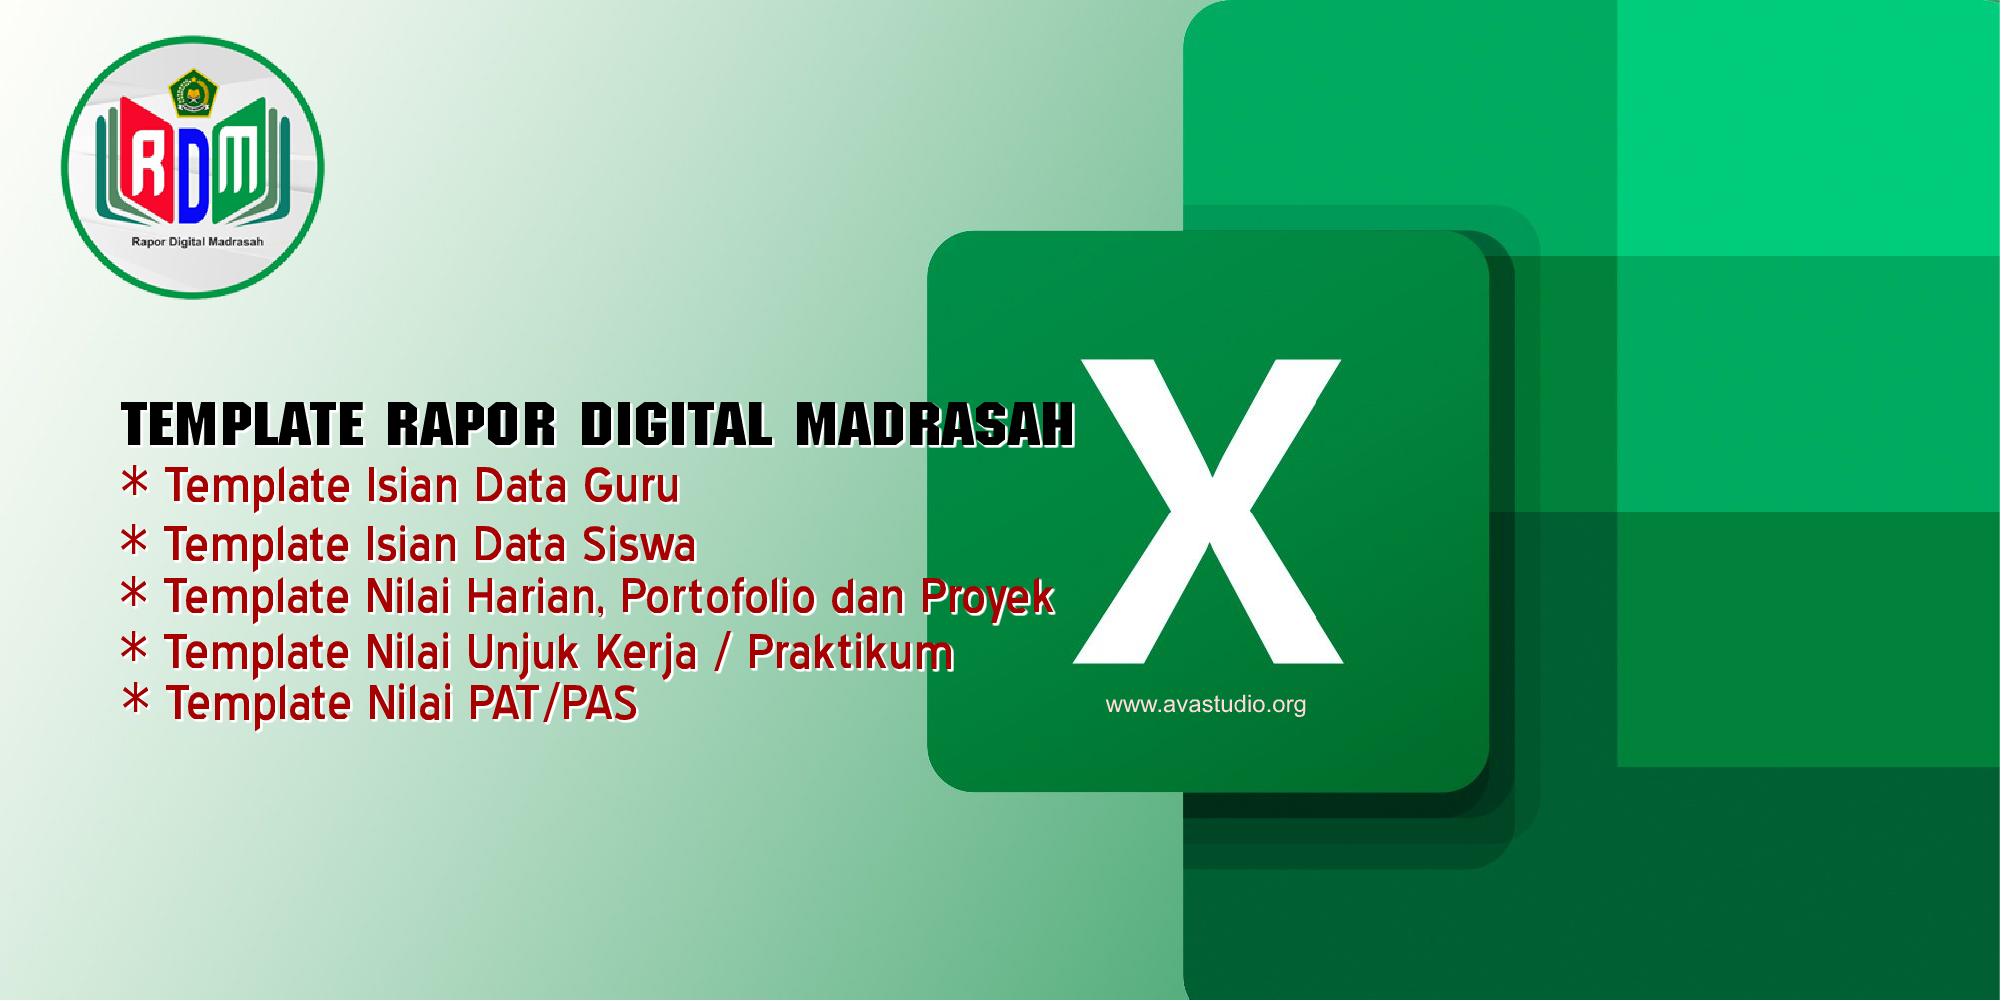 [Excel] Template Excel Isian Rapot Digital Madrasah (RDM) Tahun 2021